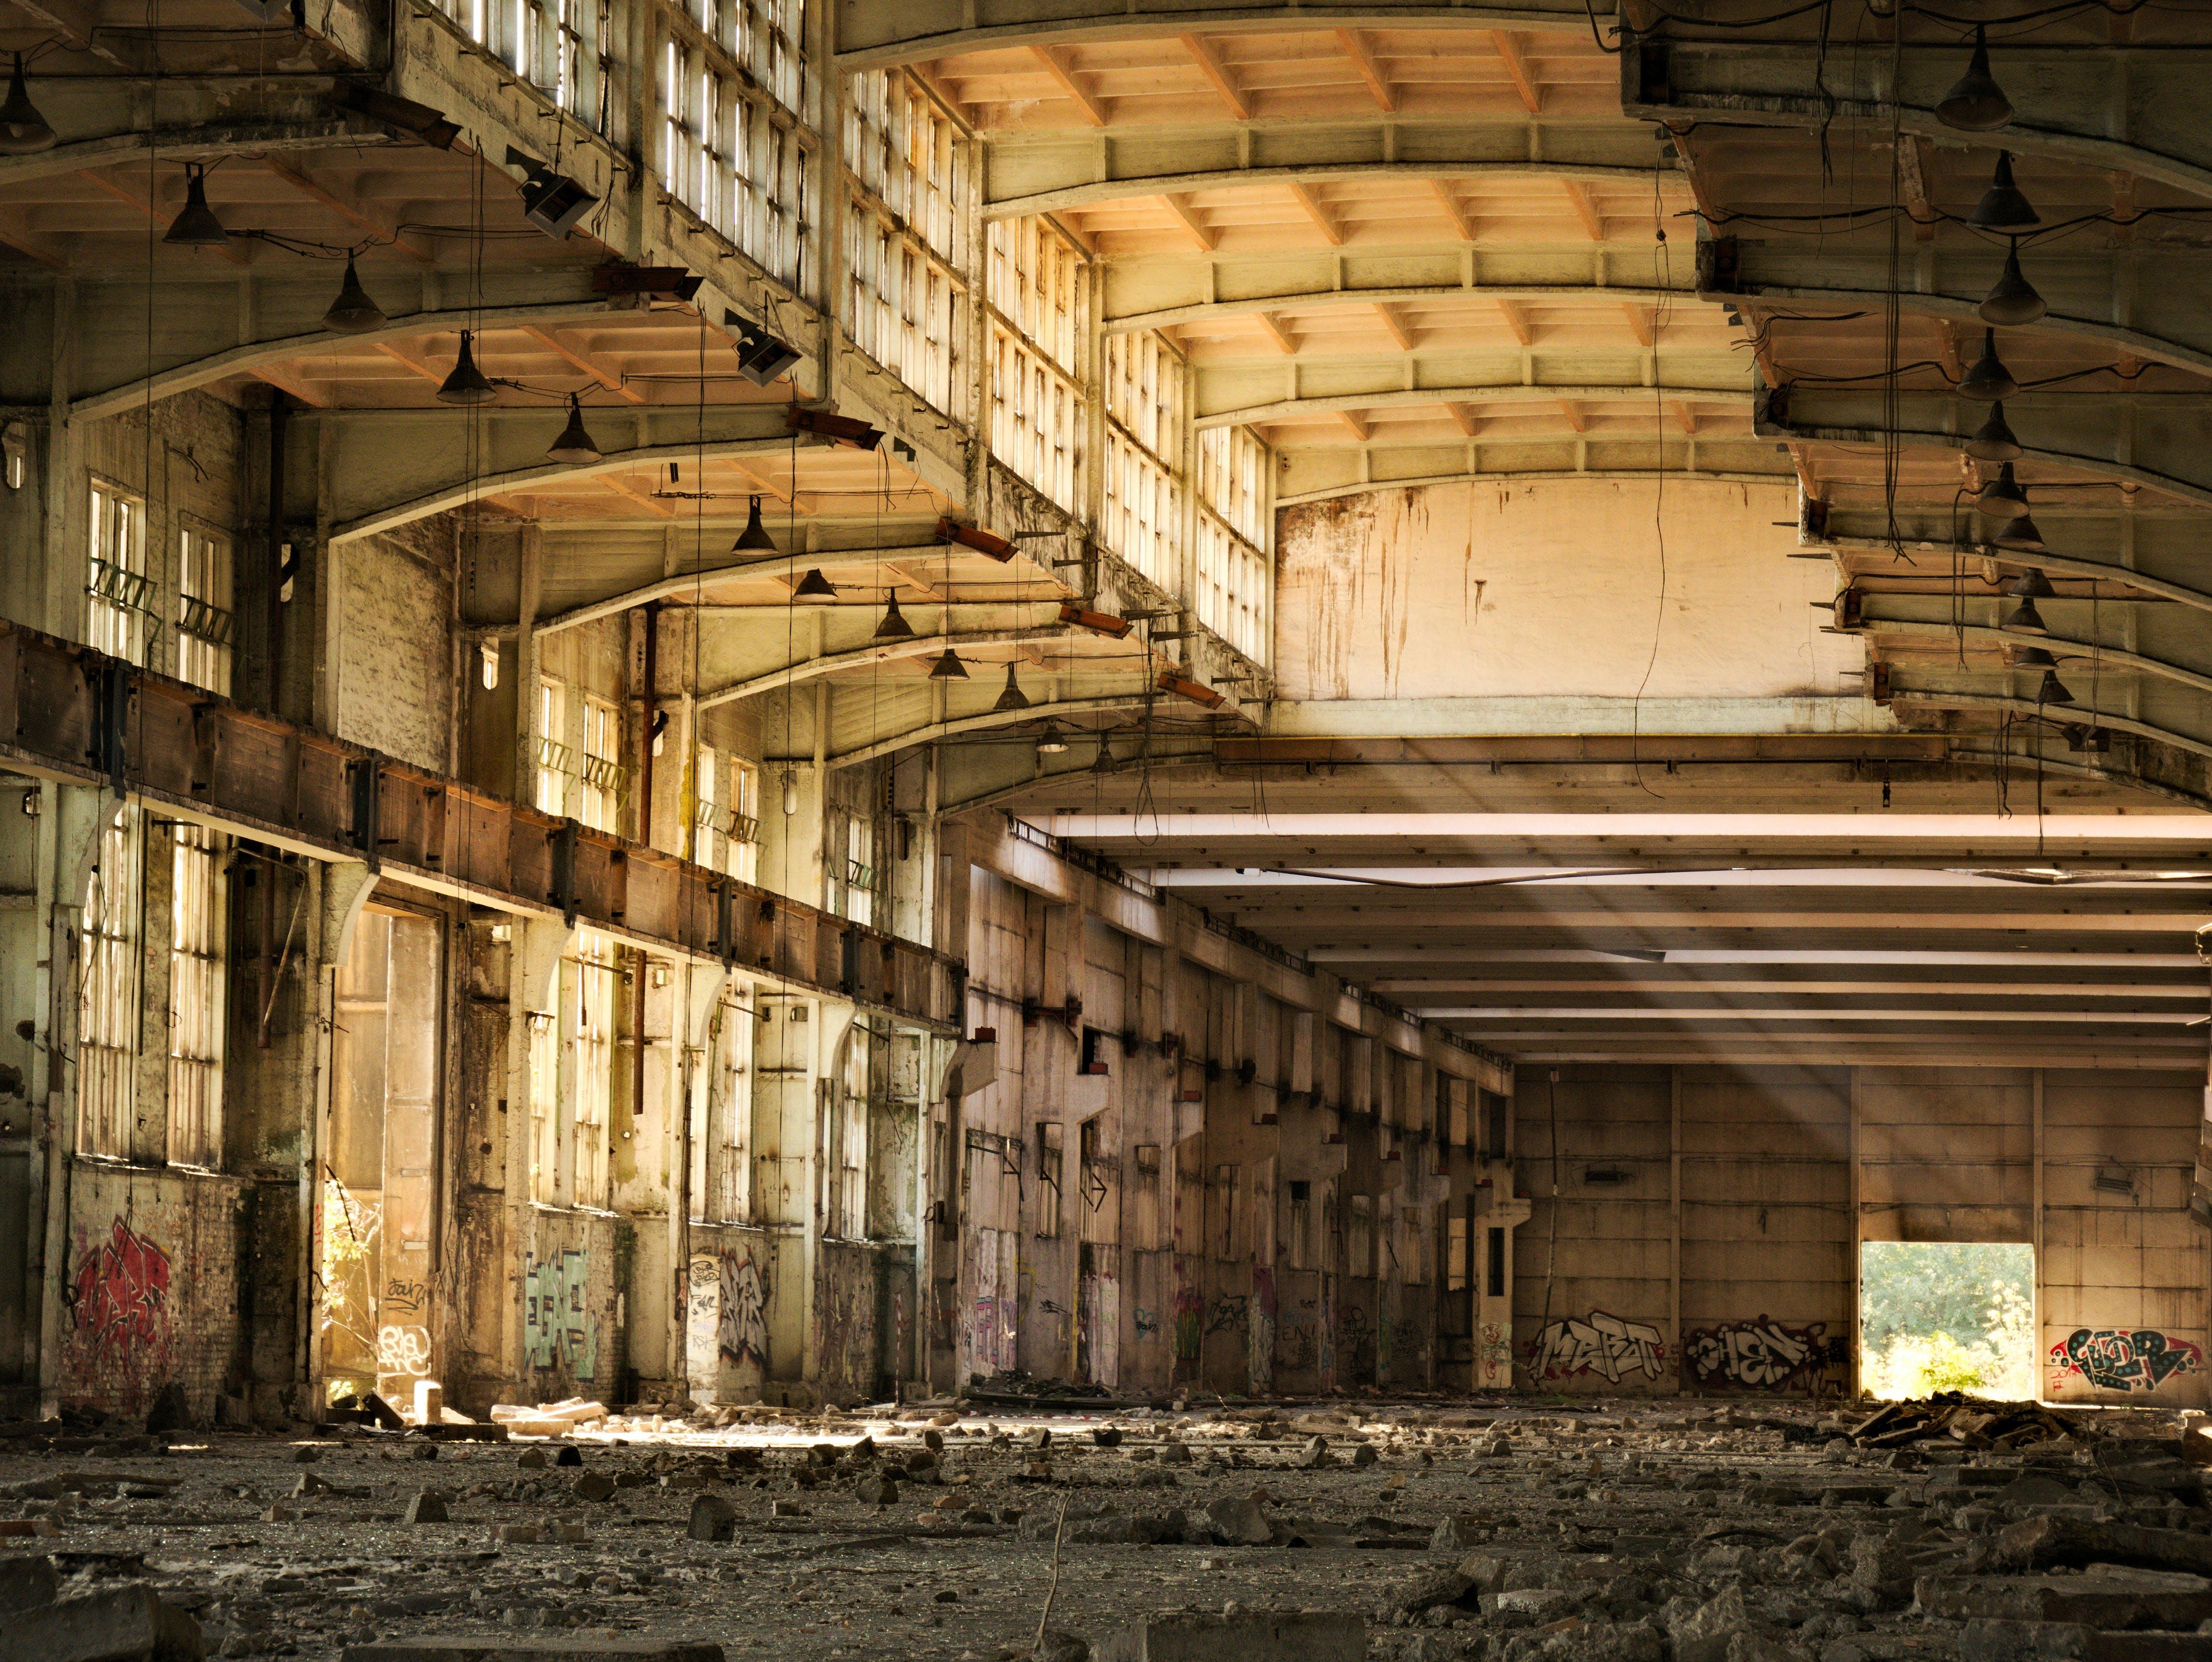 Kostenloses Stock Foto zu alte fabrik, fabrik, gebäude, graffiti